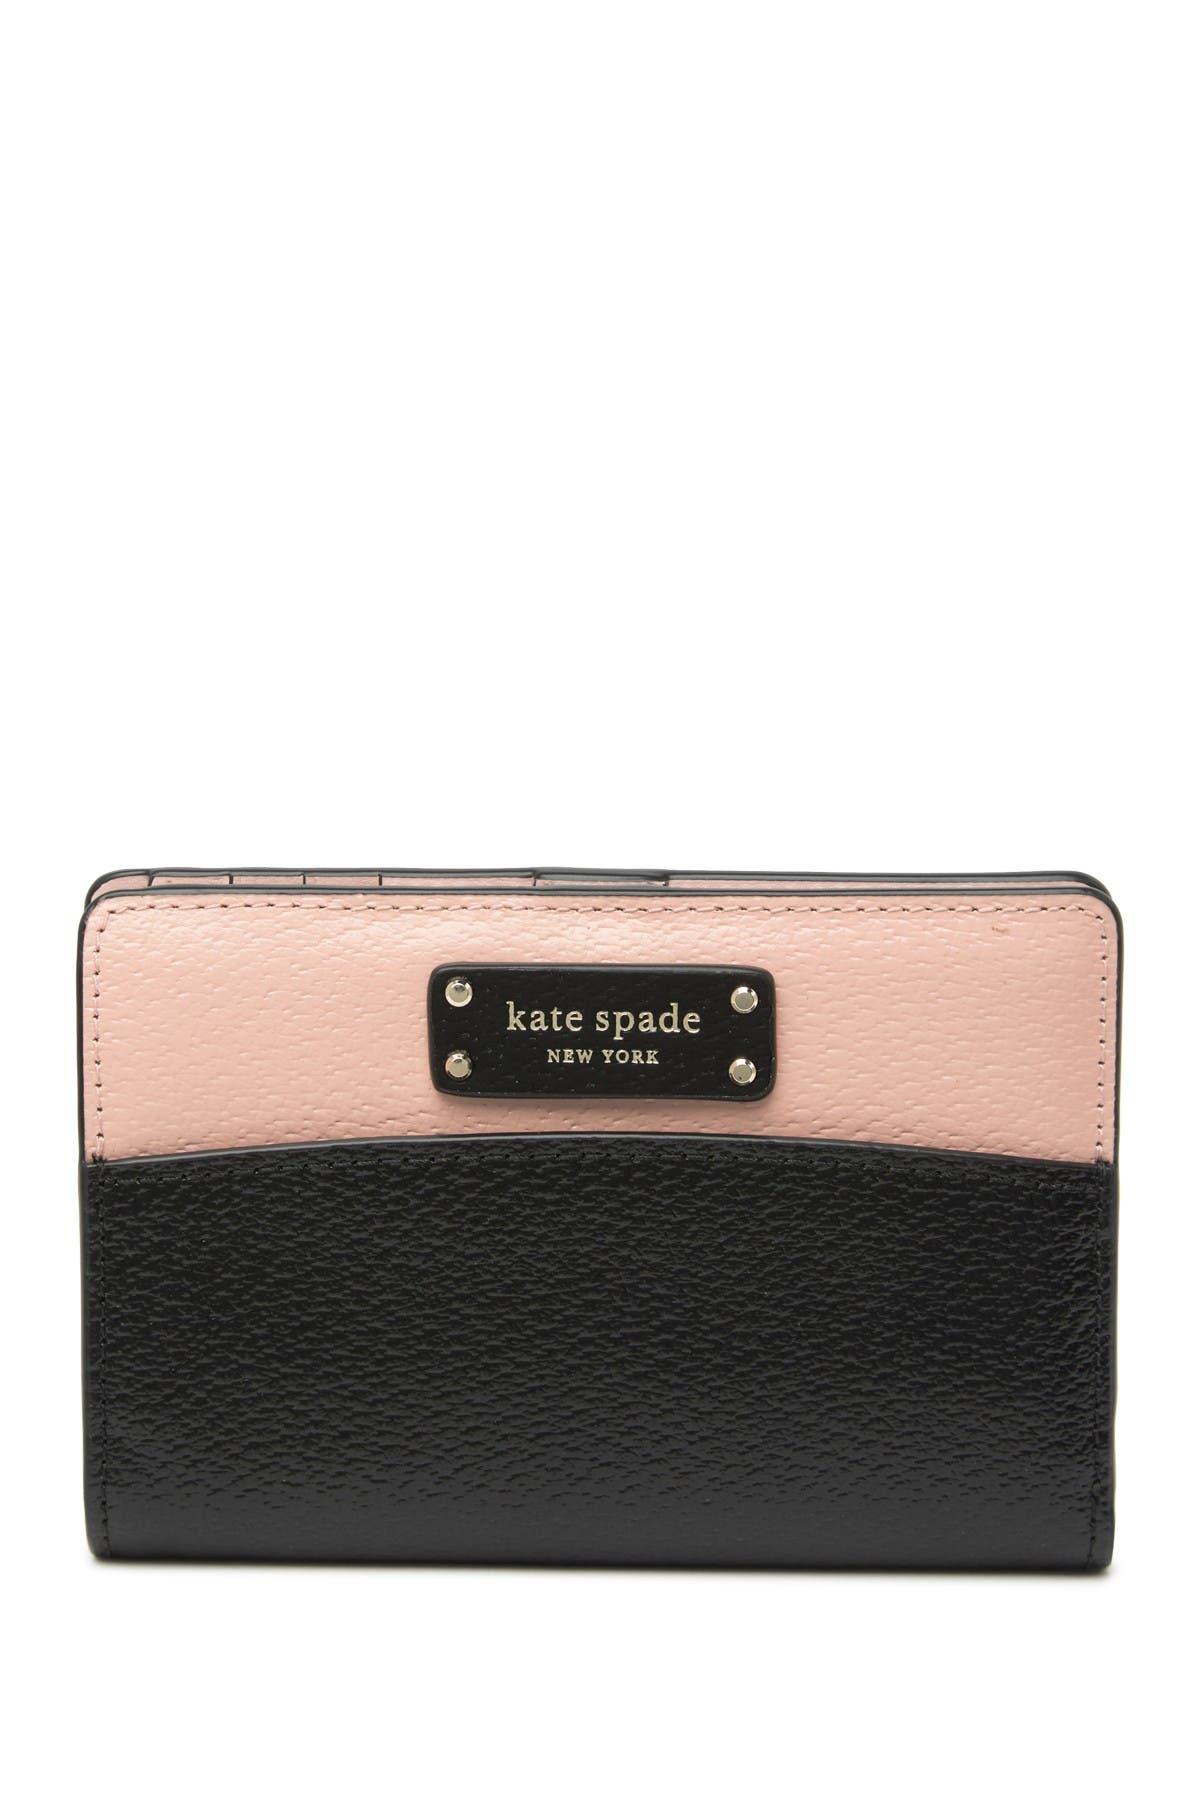 Image of kate spade new york slim bi-fold wallet